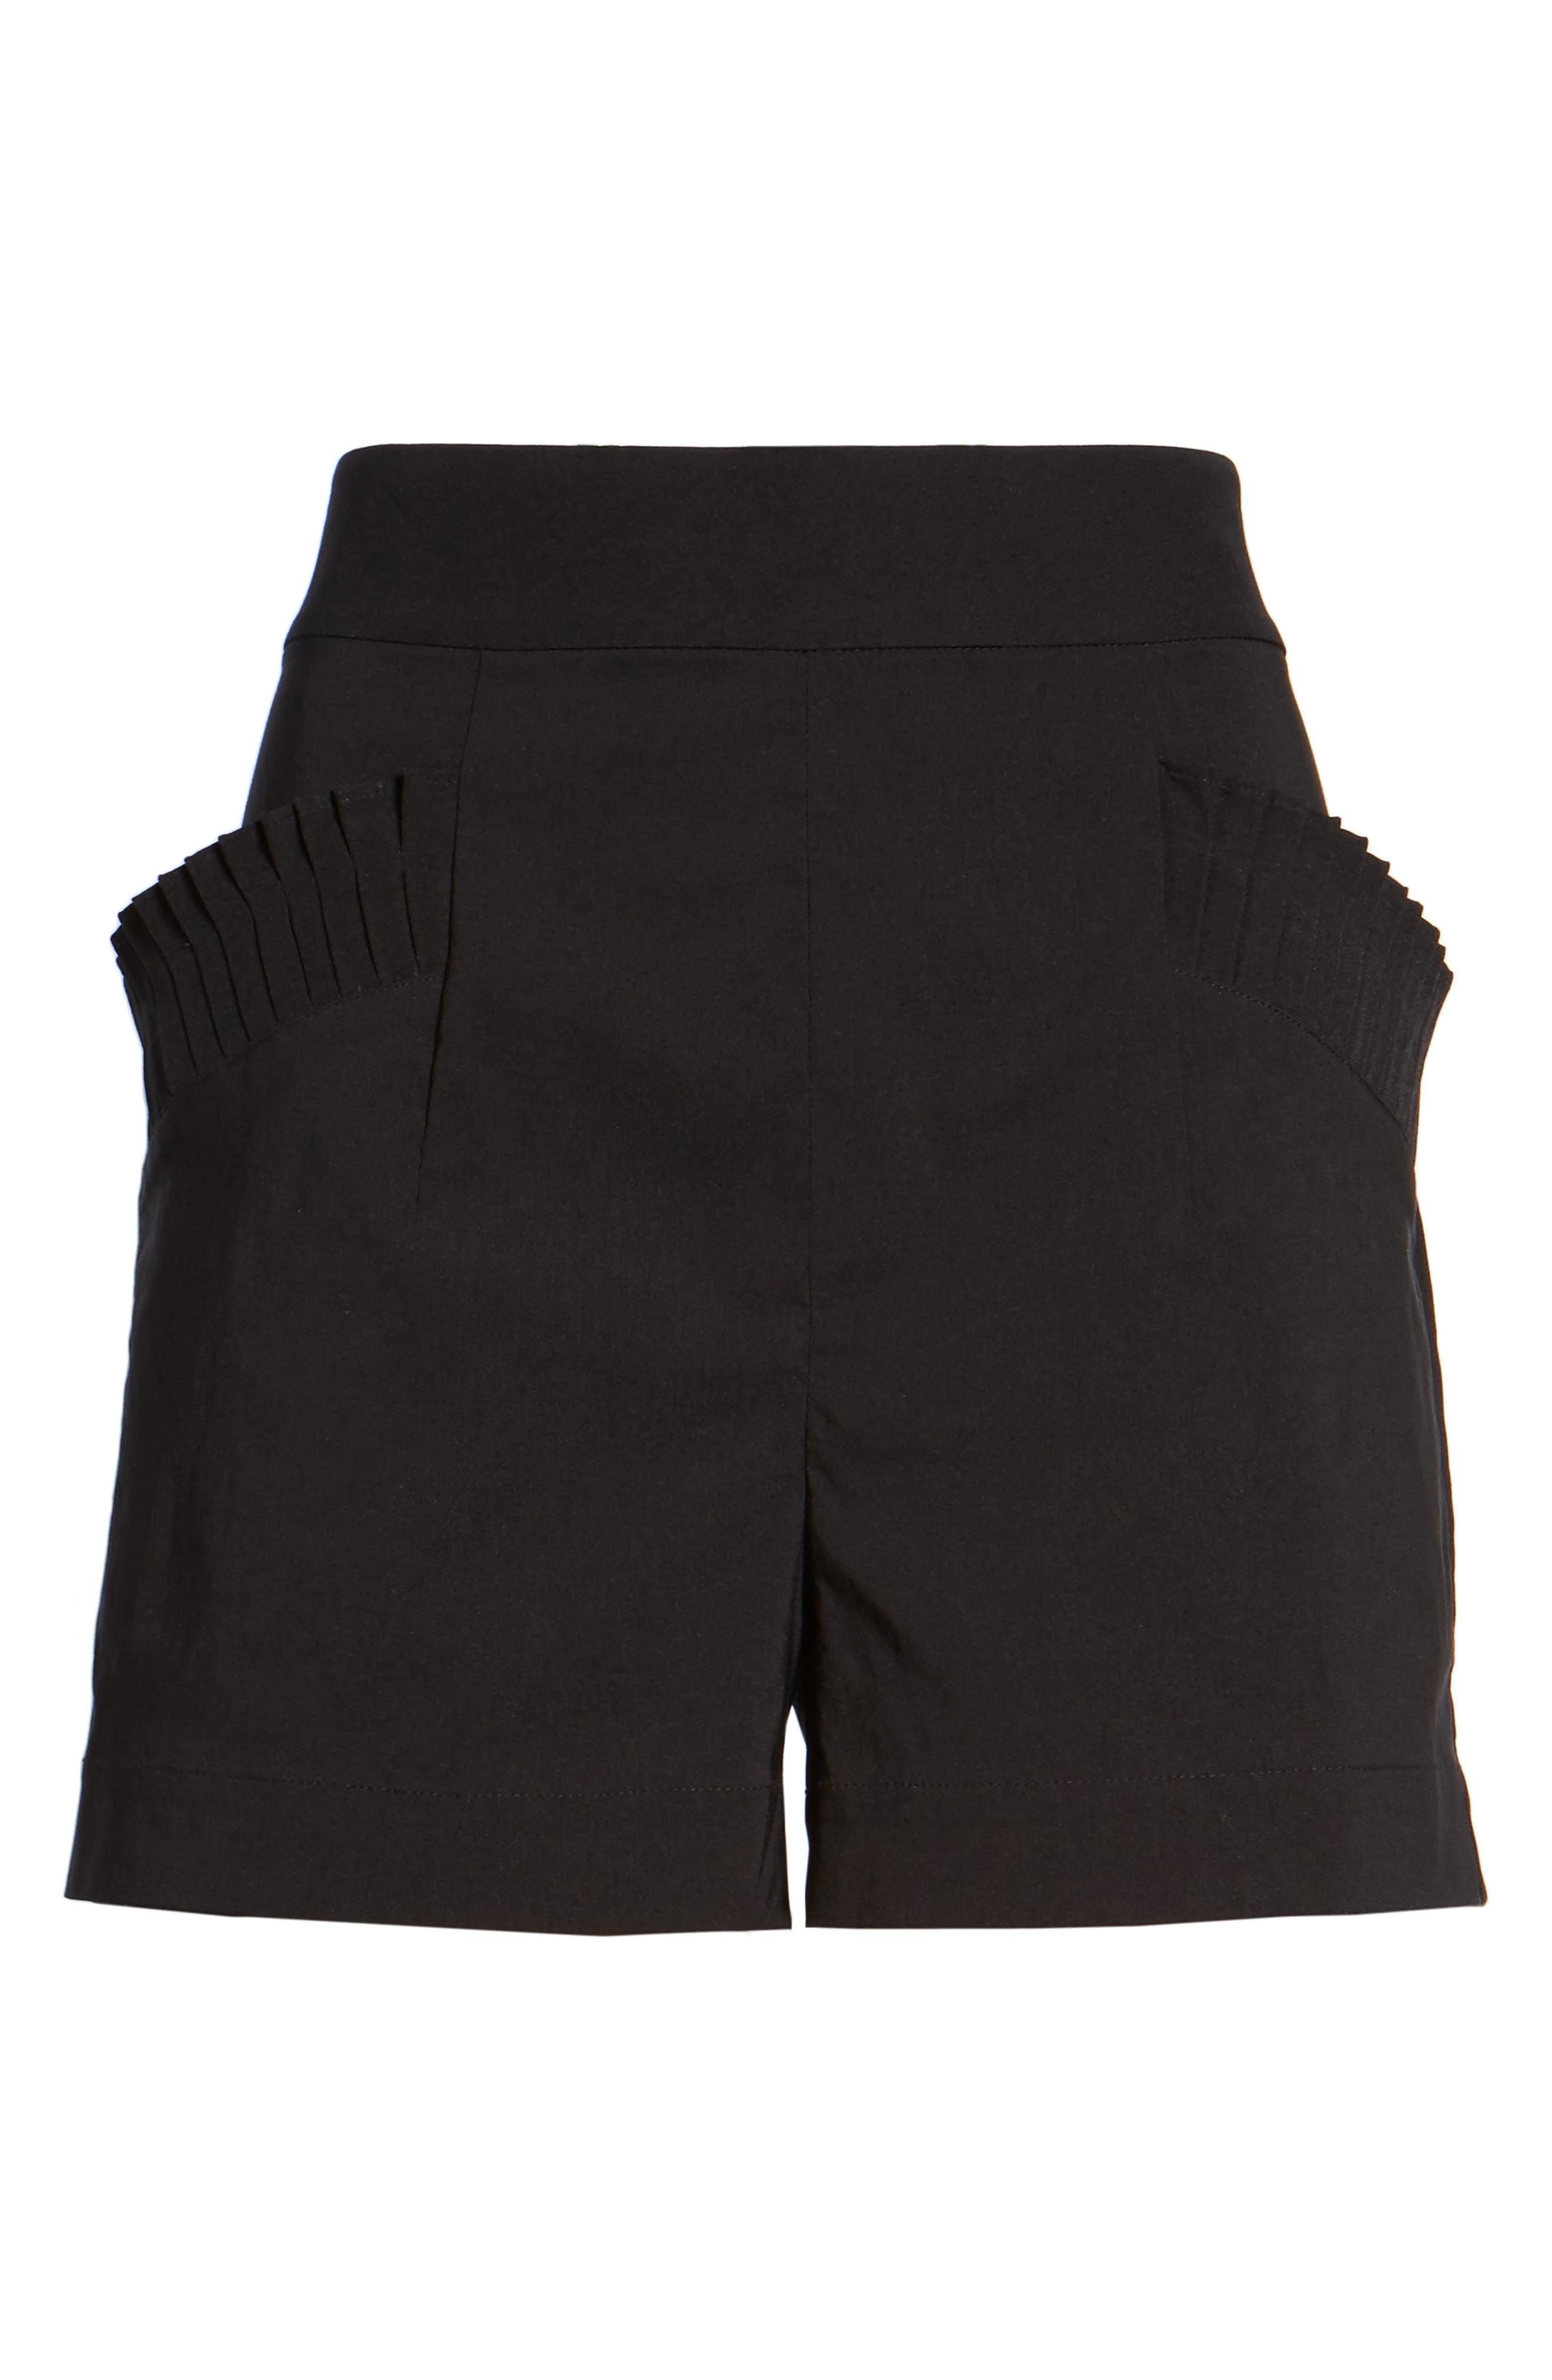 Pleat Trim High Waist Shorts,                             Alternate thumbnail 6, color,                             001